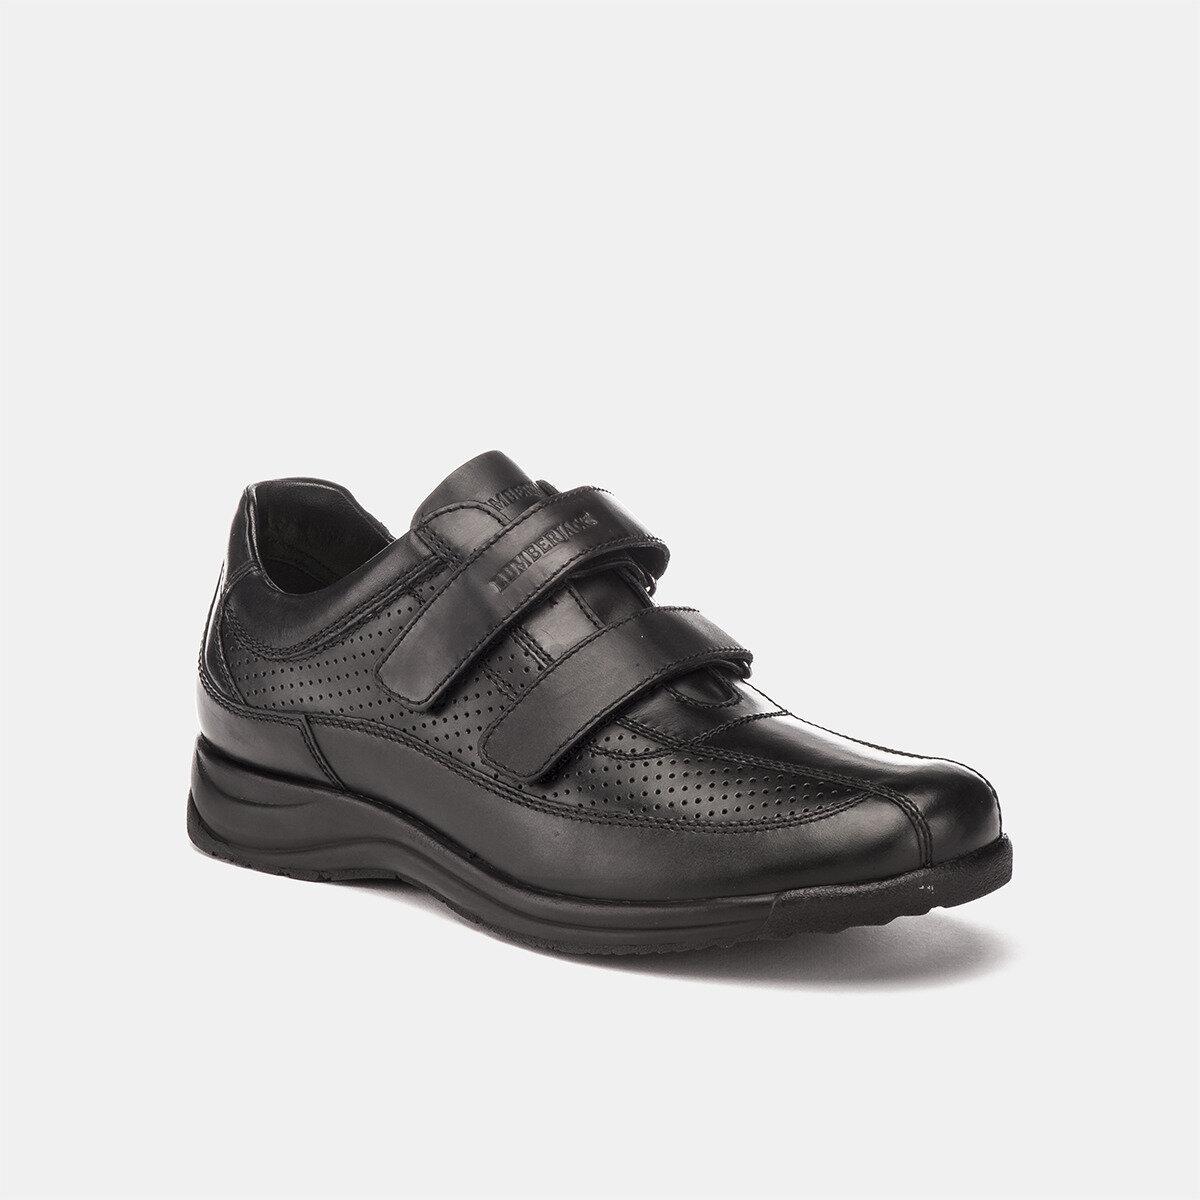 AIRJACK BLACK Man Casual shoes